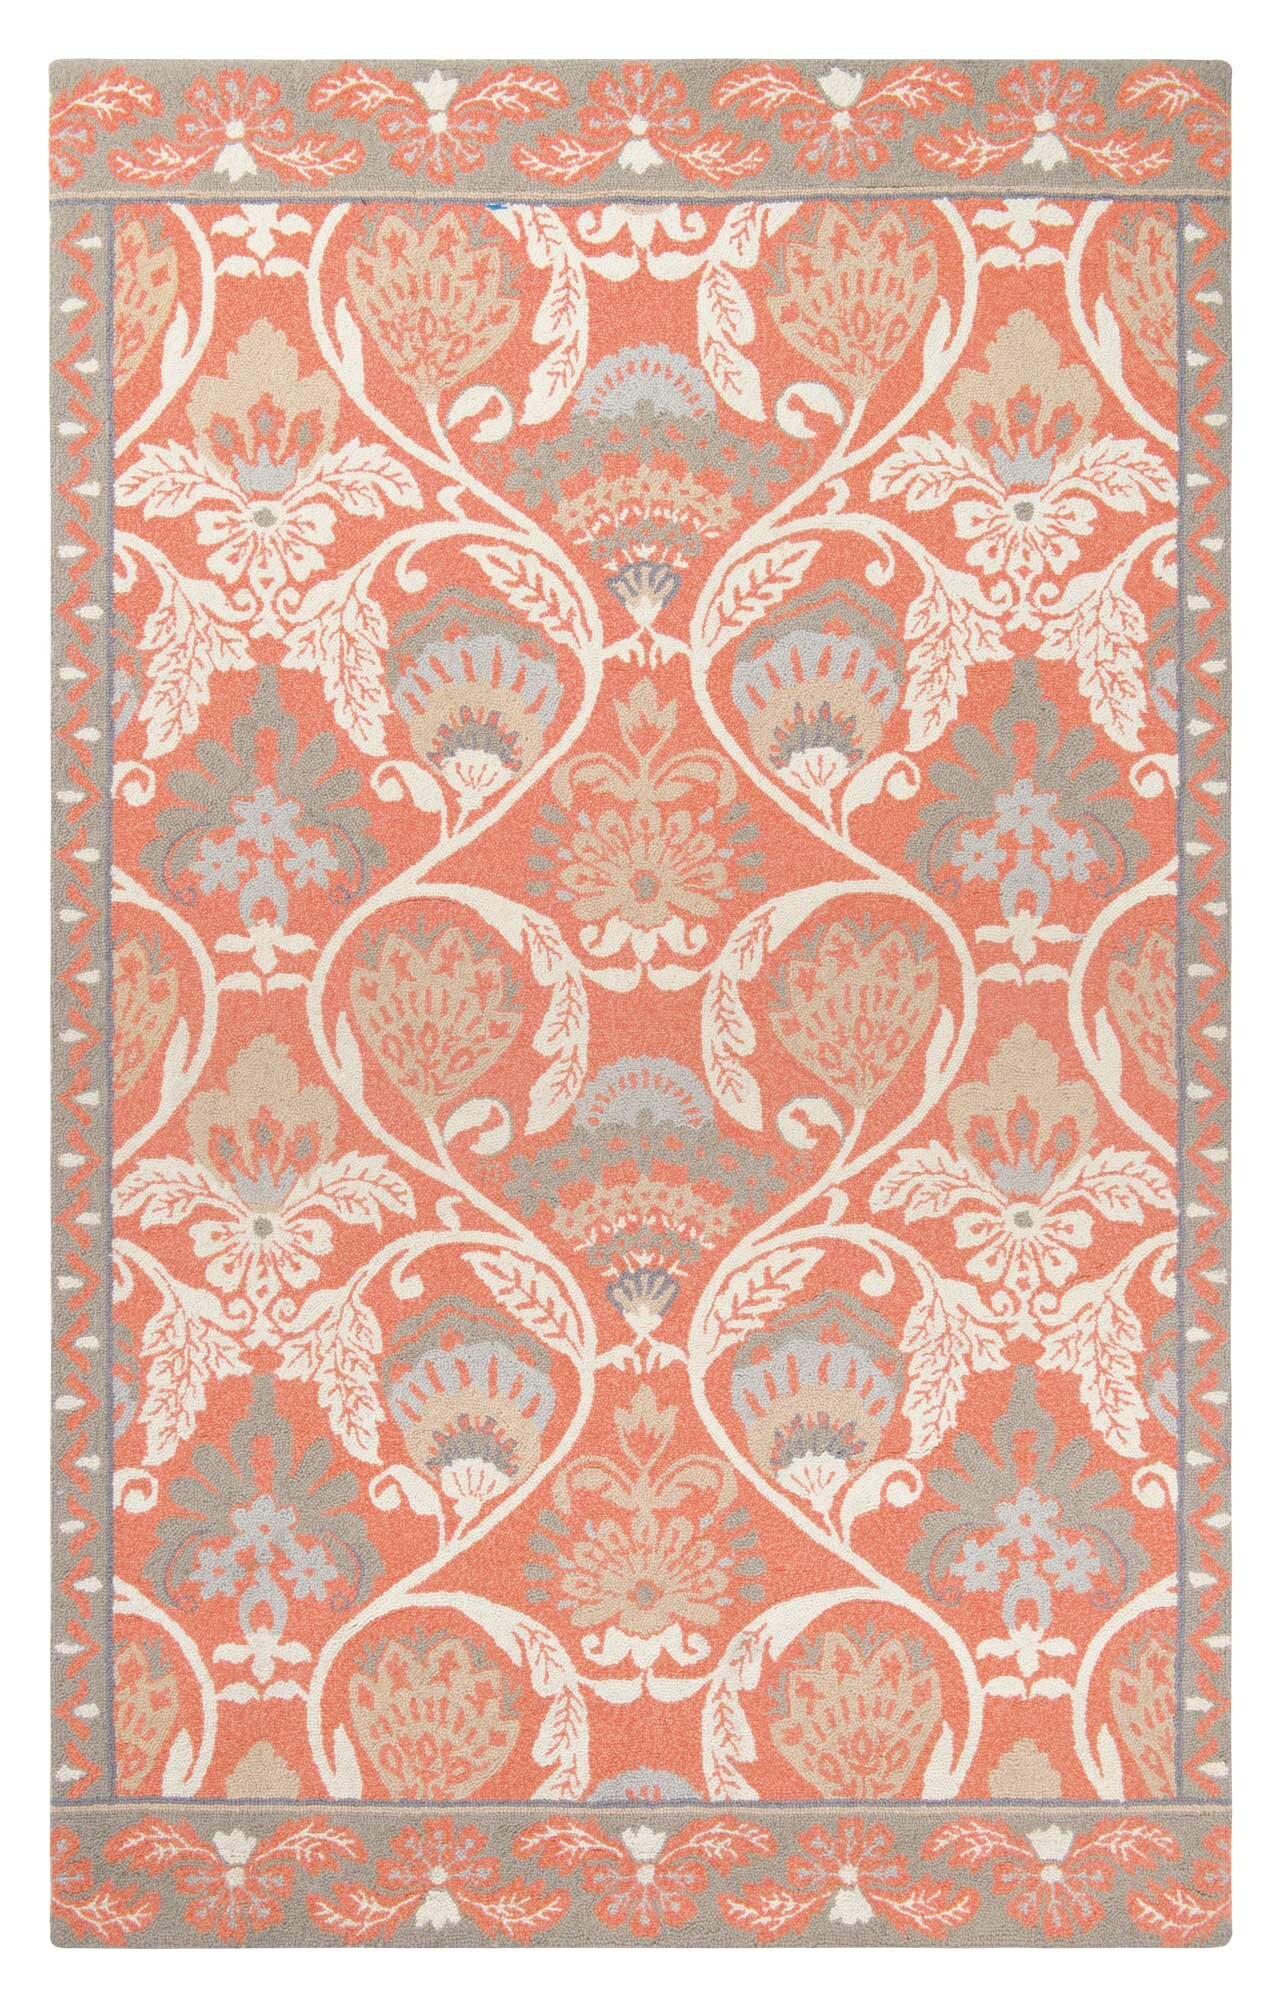 Companyc quinn hand hooked coral area rug wayfair